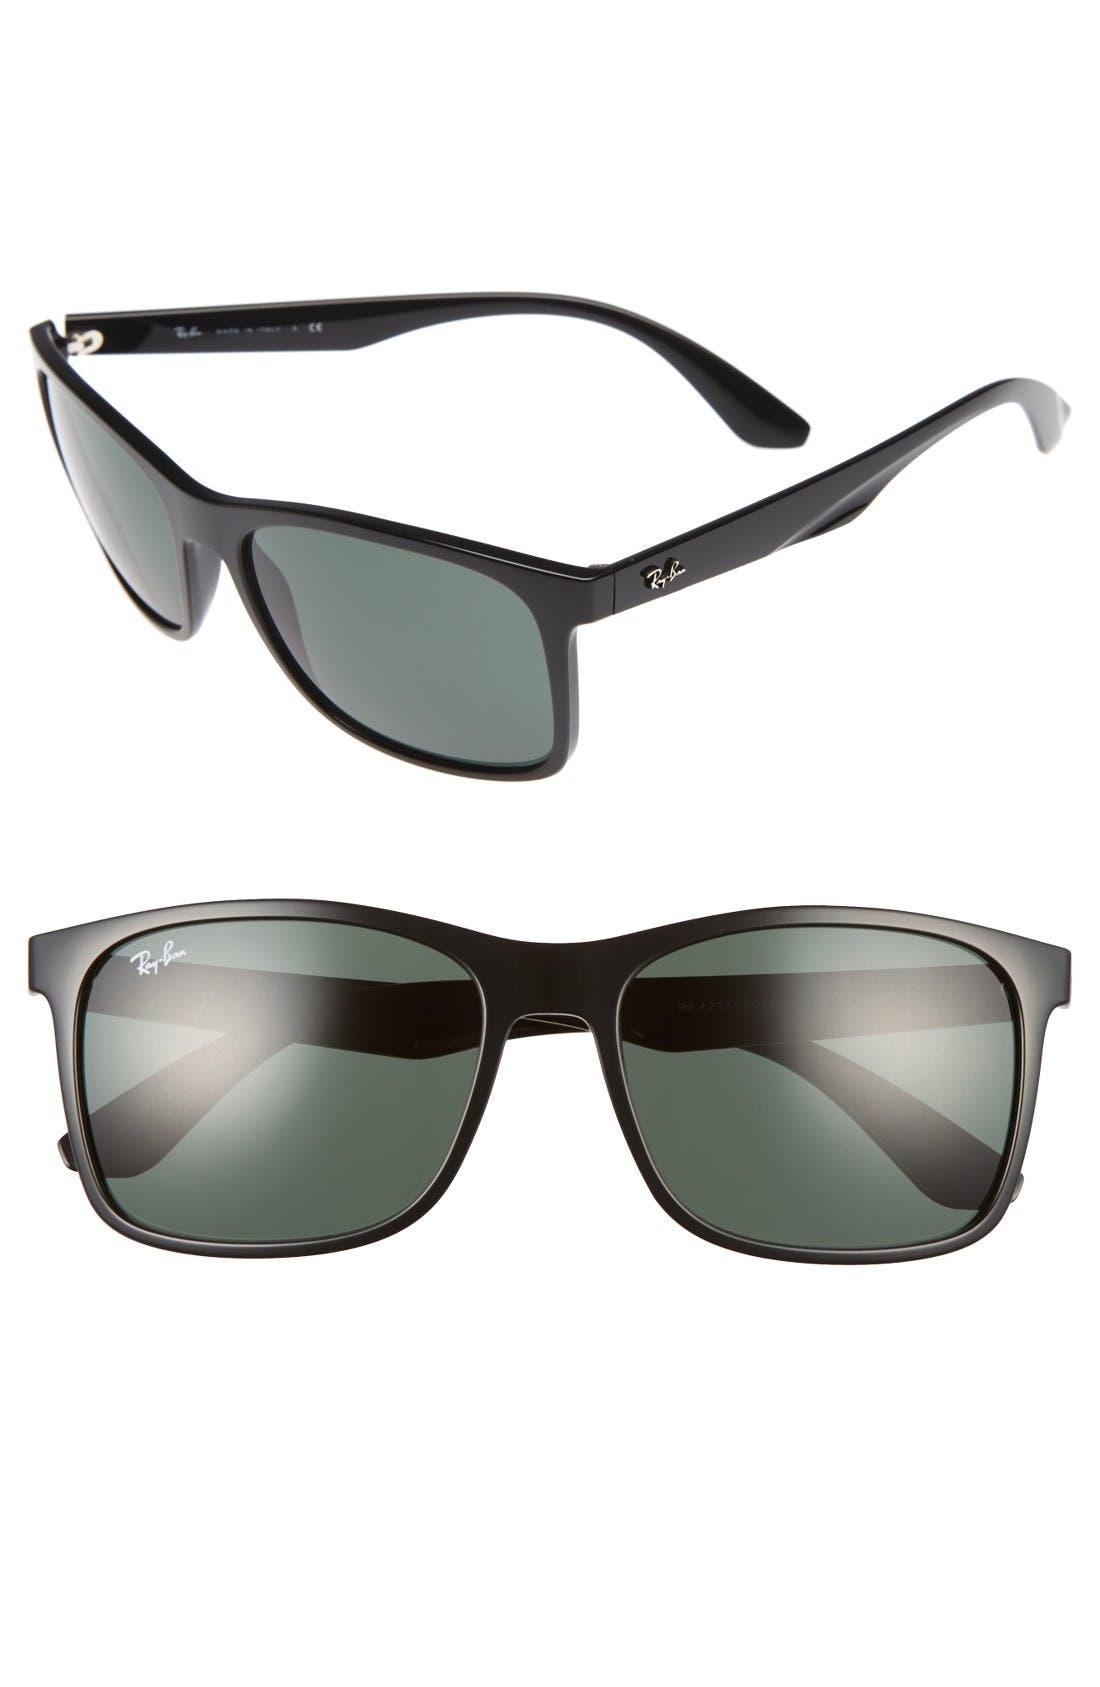 57mm Square Sunglasses,                             Main thumbnail 1, color,                             Black / Grey Green